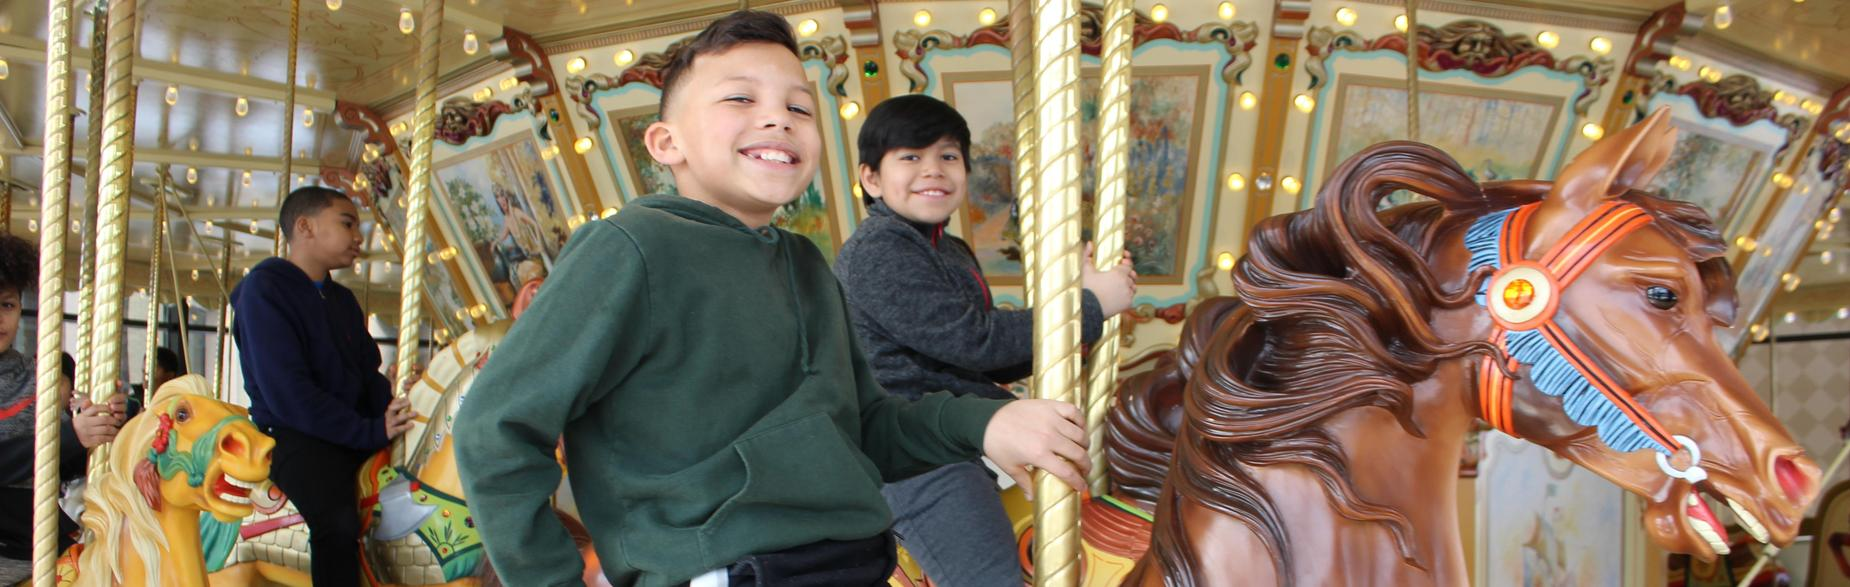 Student riding carousel